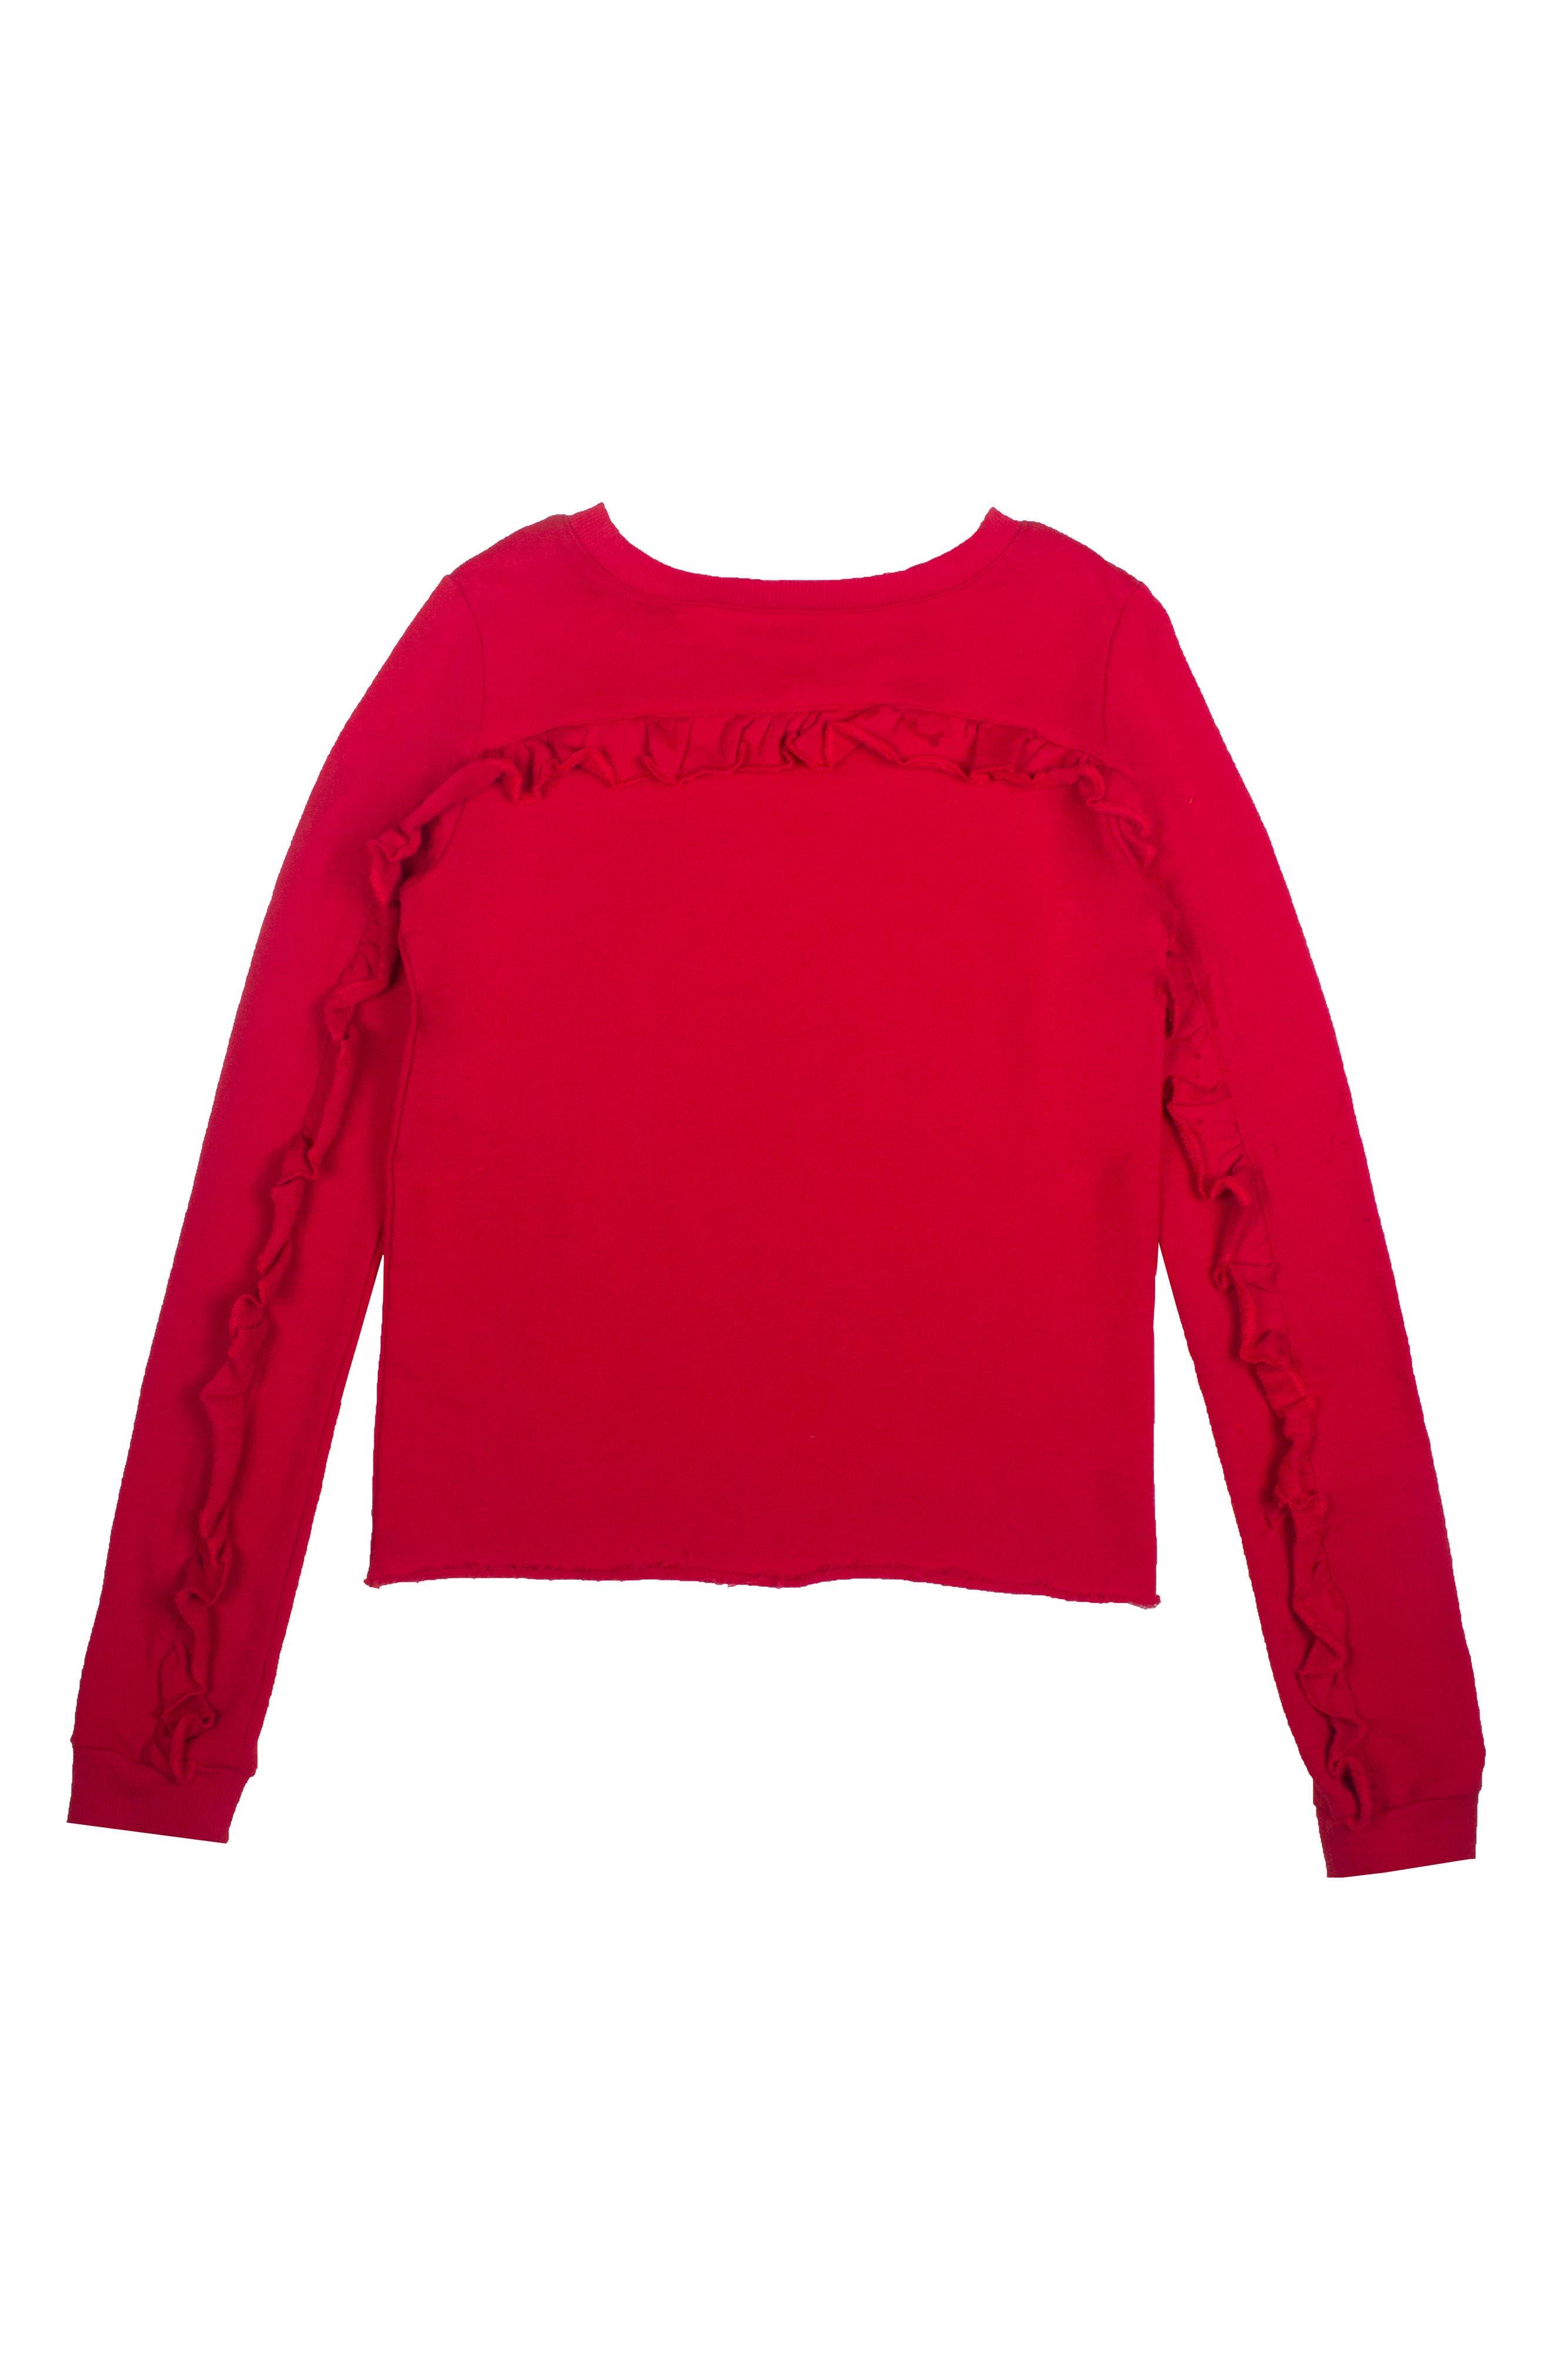 Ruffle Sweatshirt,                             Main thumbnail 1, color,                             Red Rose